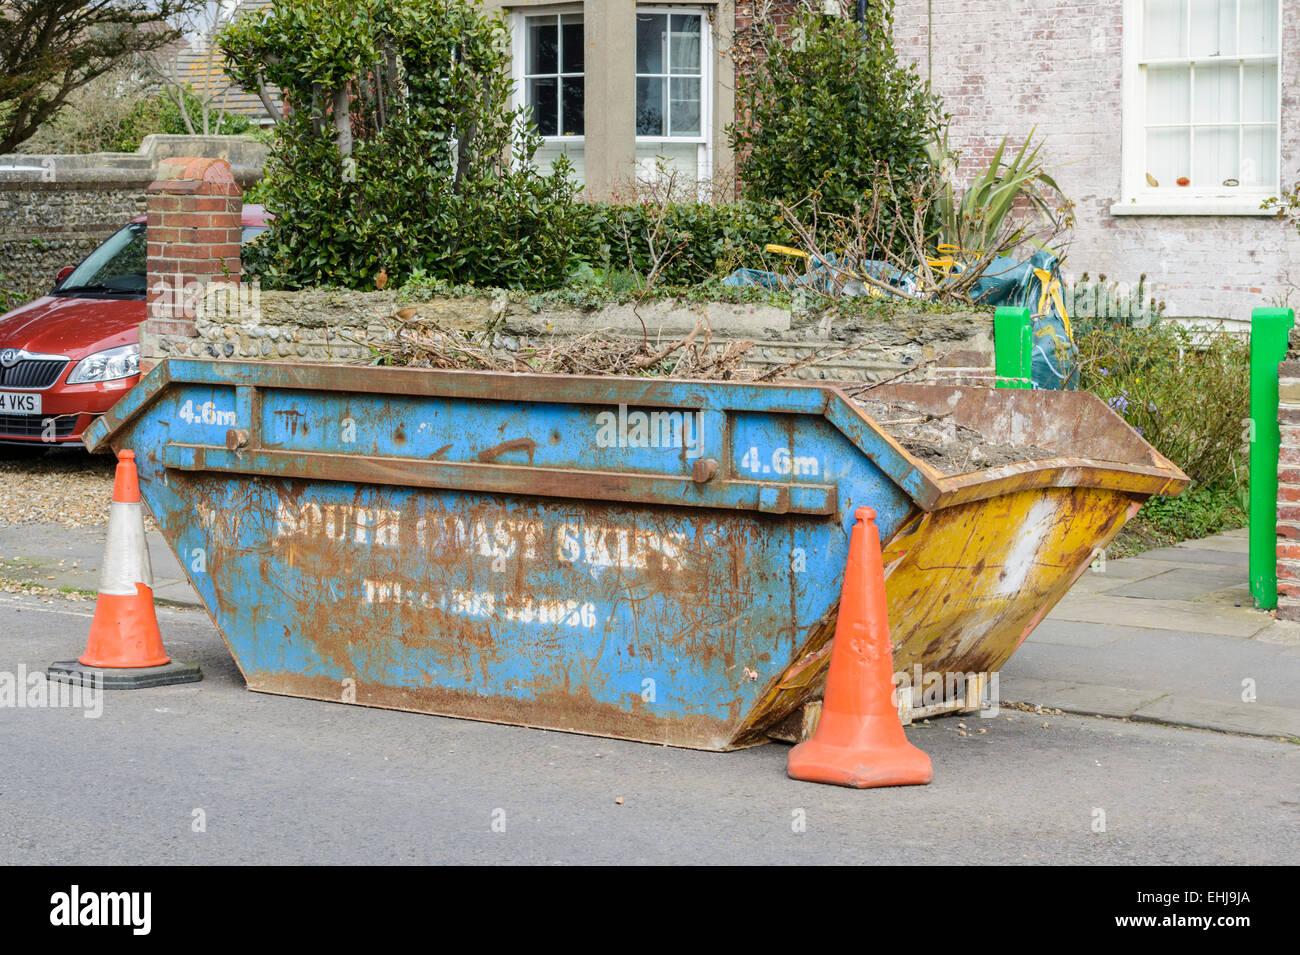 Una basura skip estacionado en la carretera. Imagen De Stock